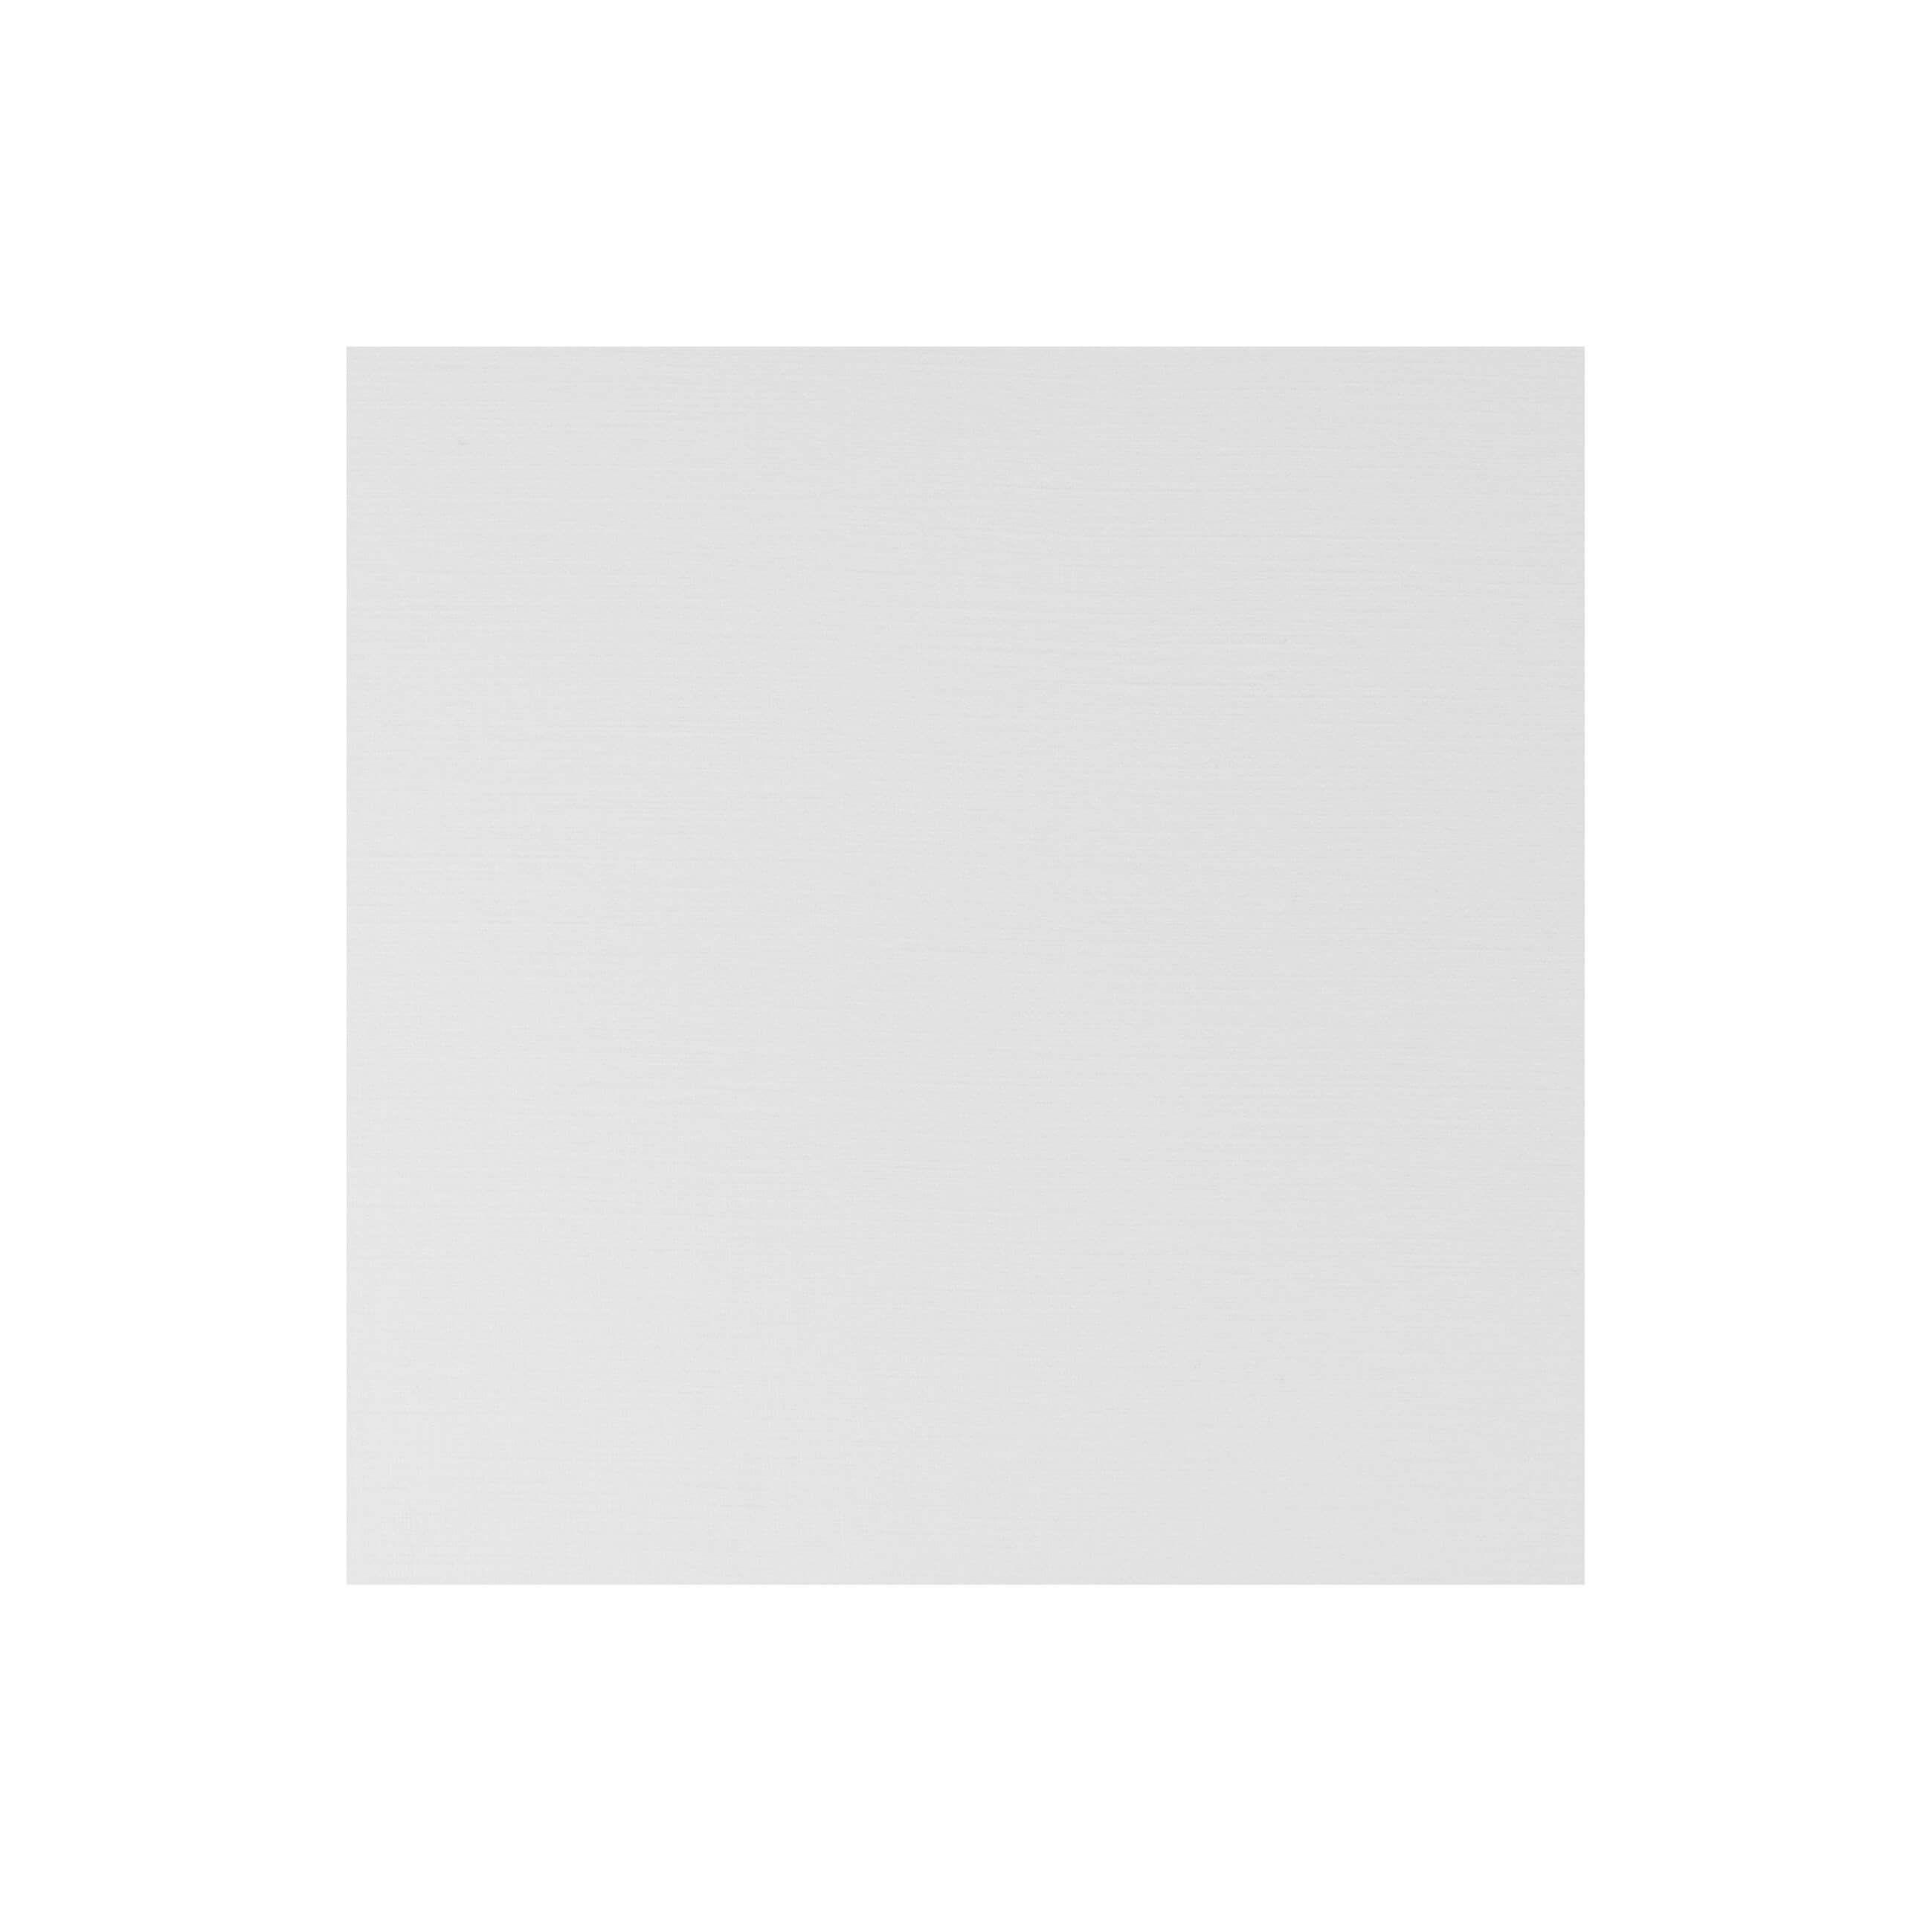 Cardstock 141mm Square - Silkweave White